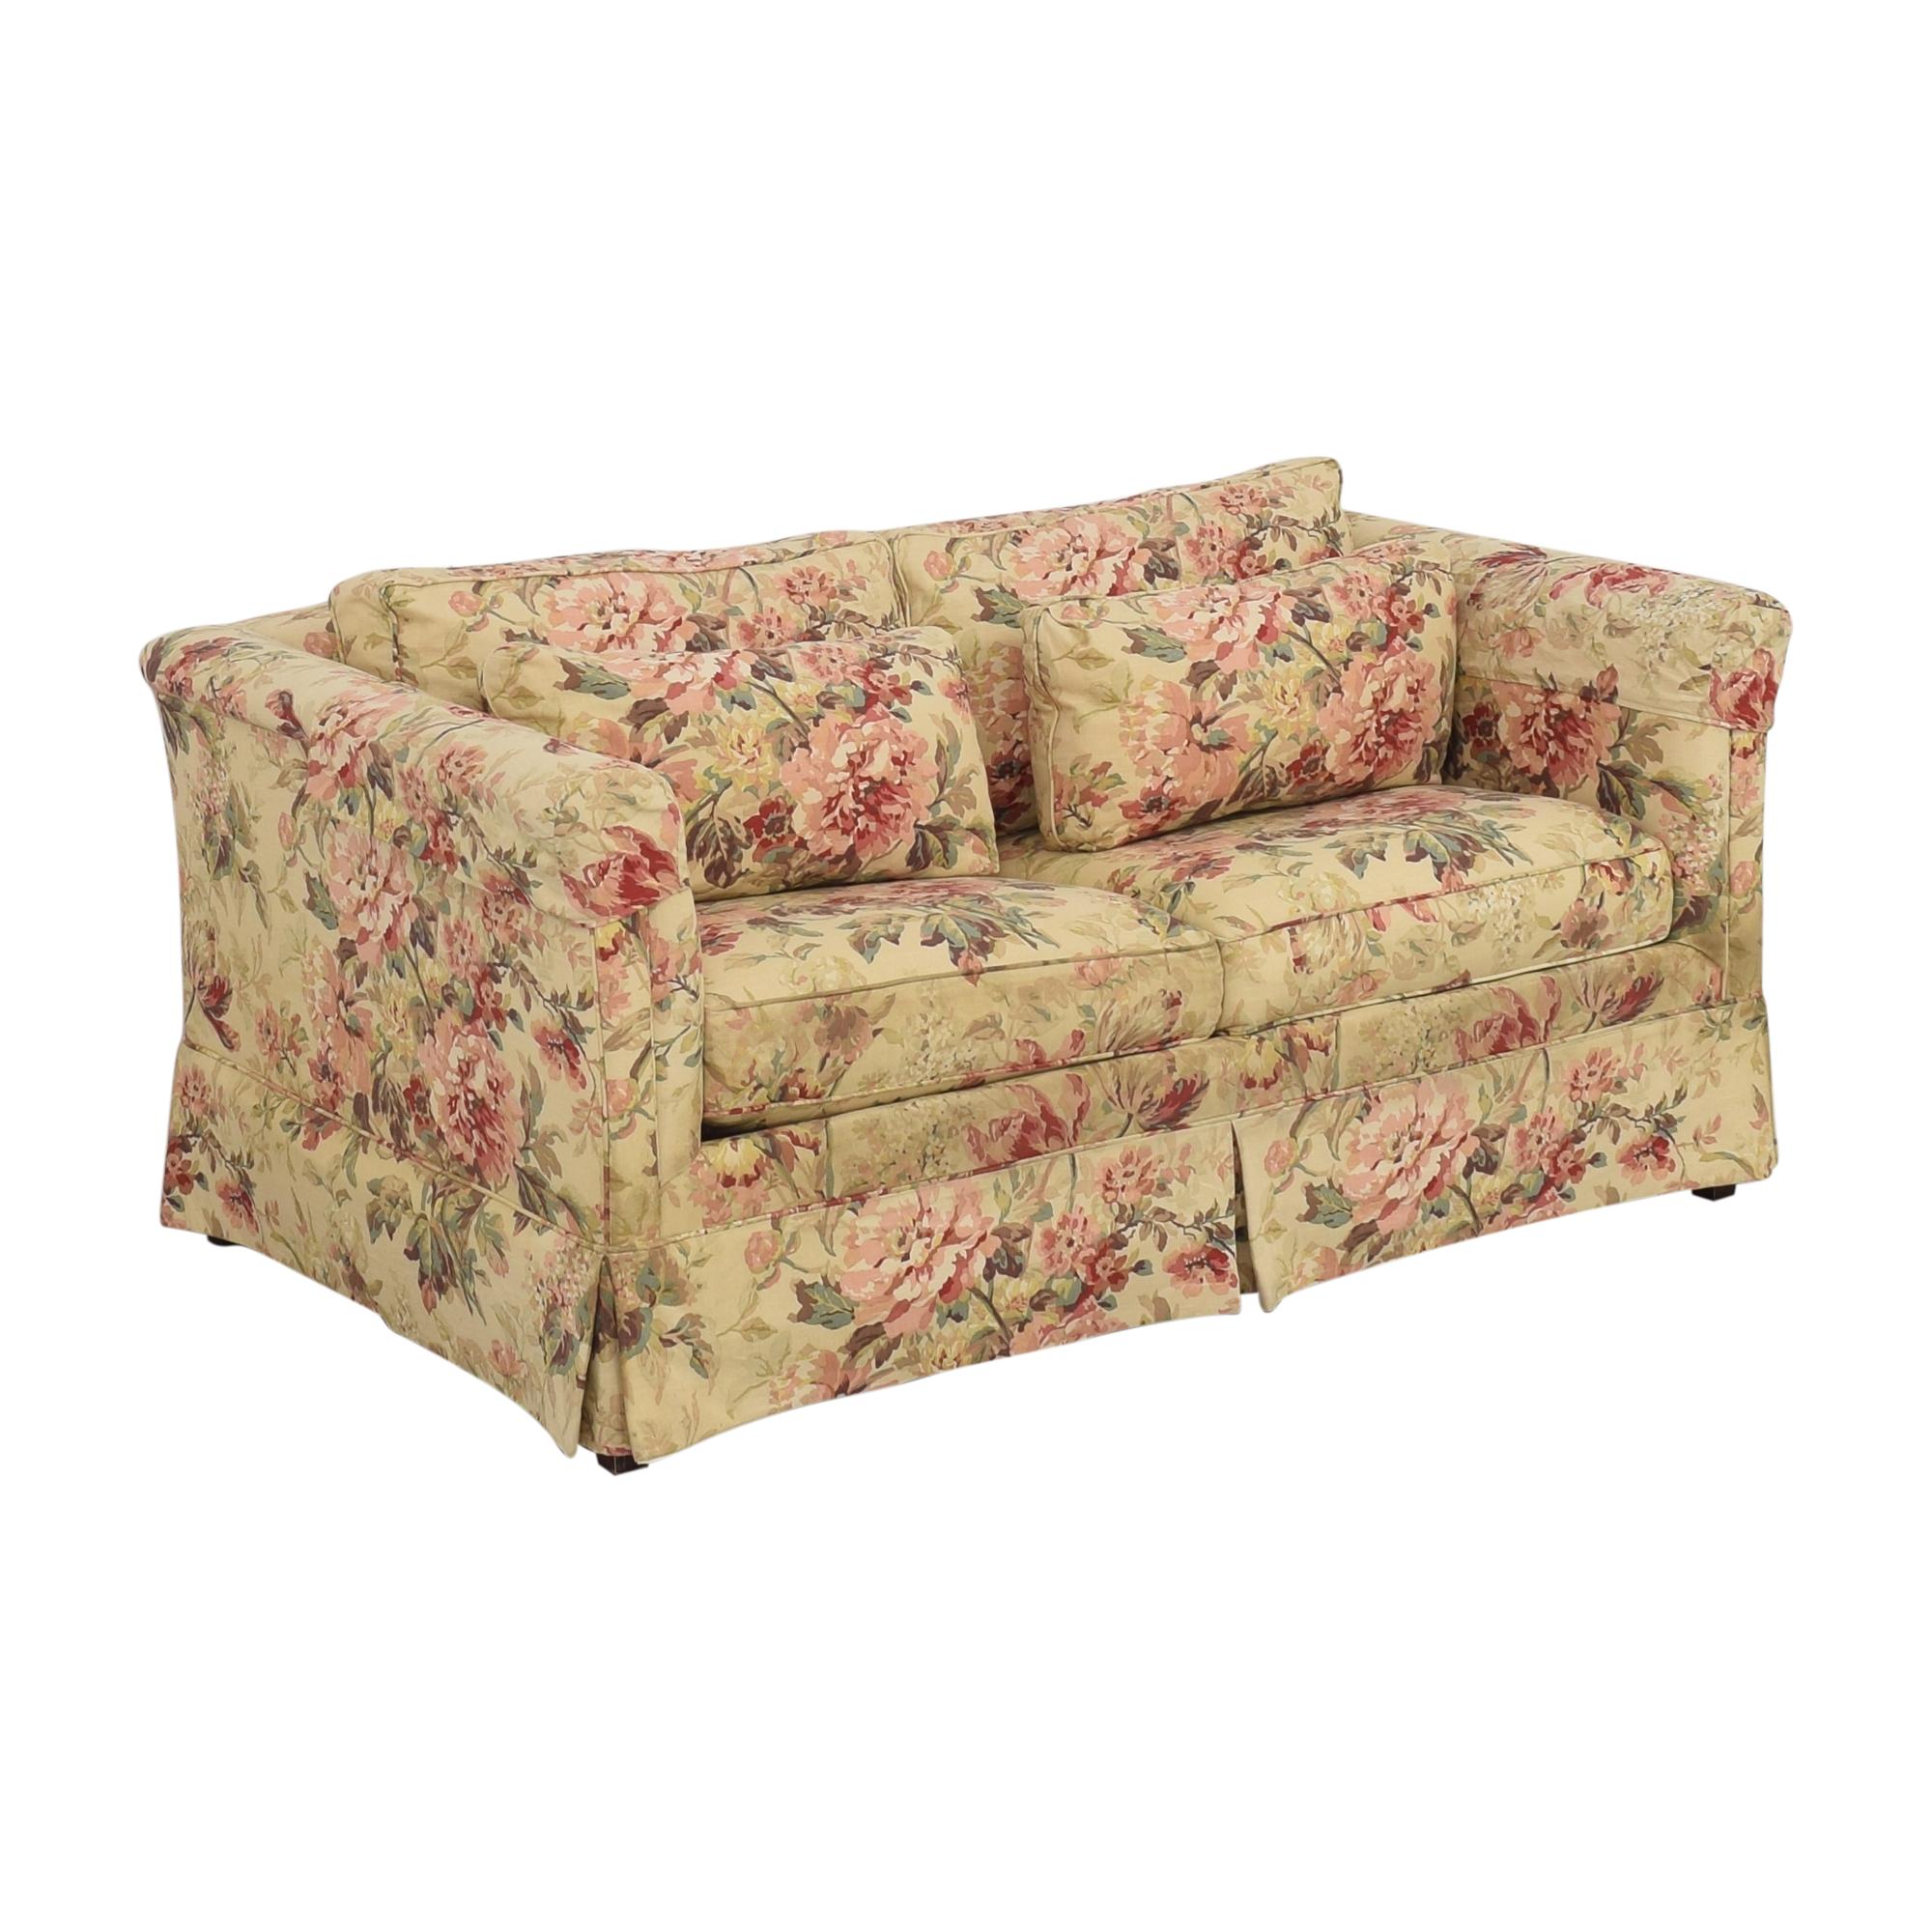 William Alan William Alan Loveseat Sleeper Sofa multi